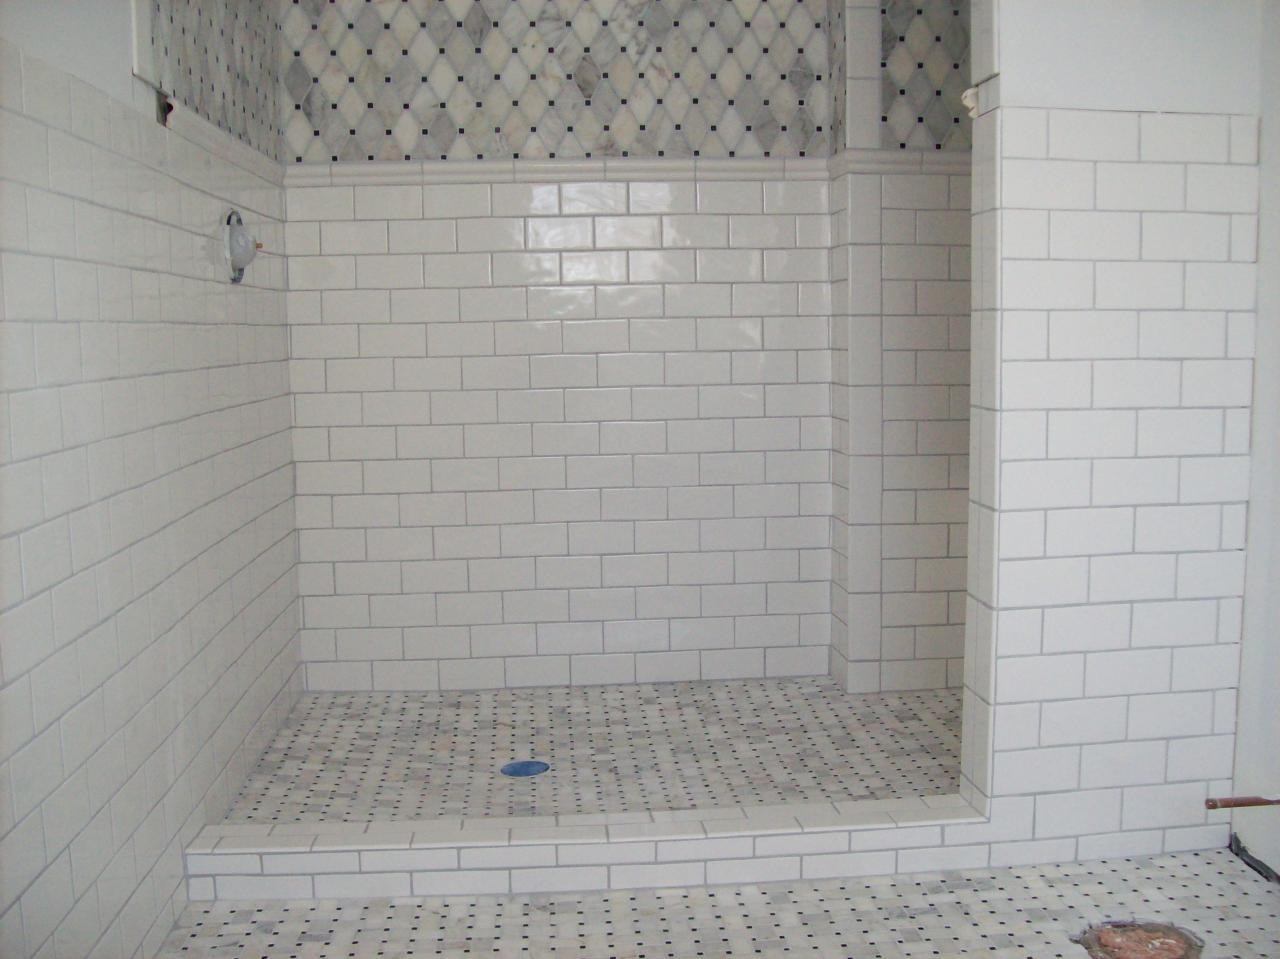 Bathroom tile pics large and beautiful photos Photo to select